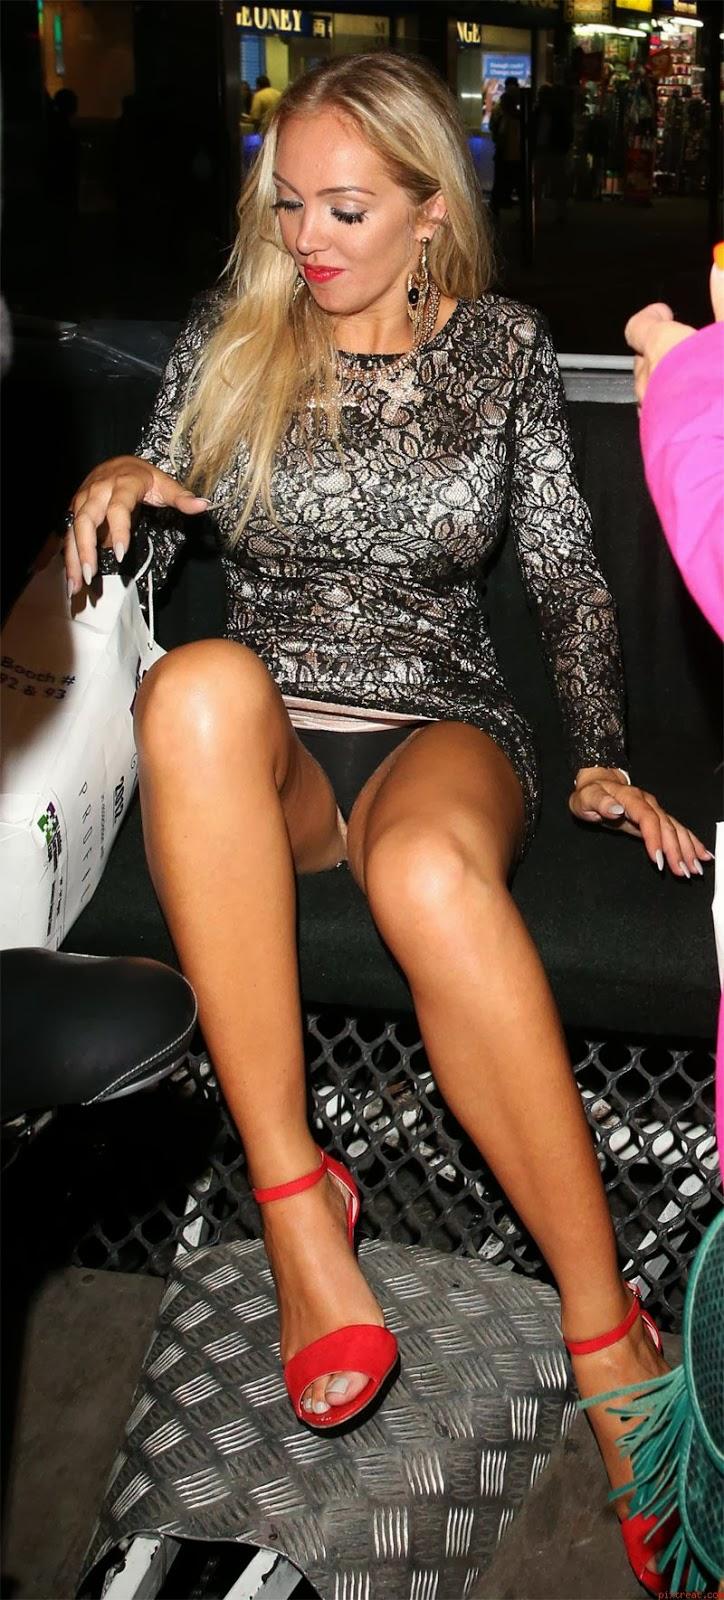 Aisleyne hogan wallace naked pussy not give